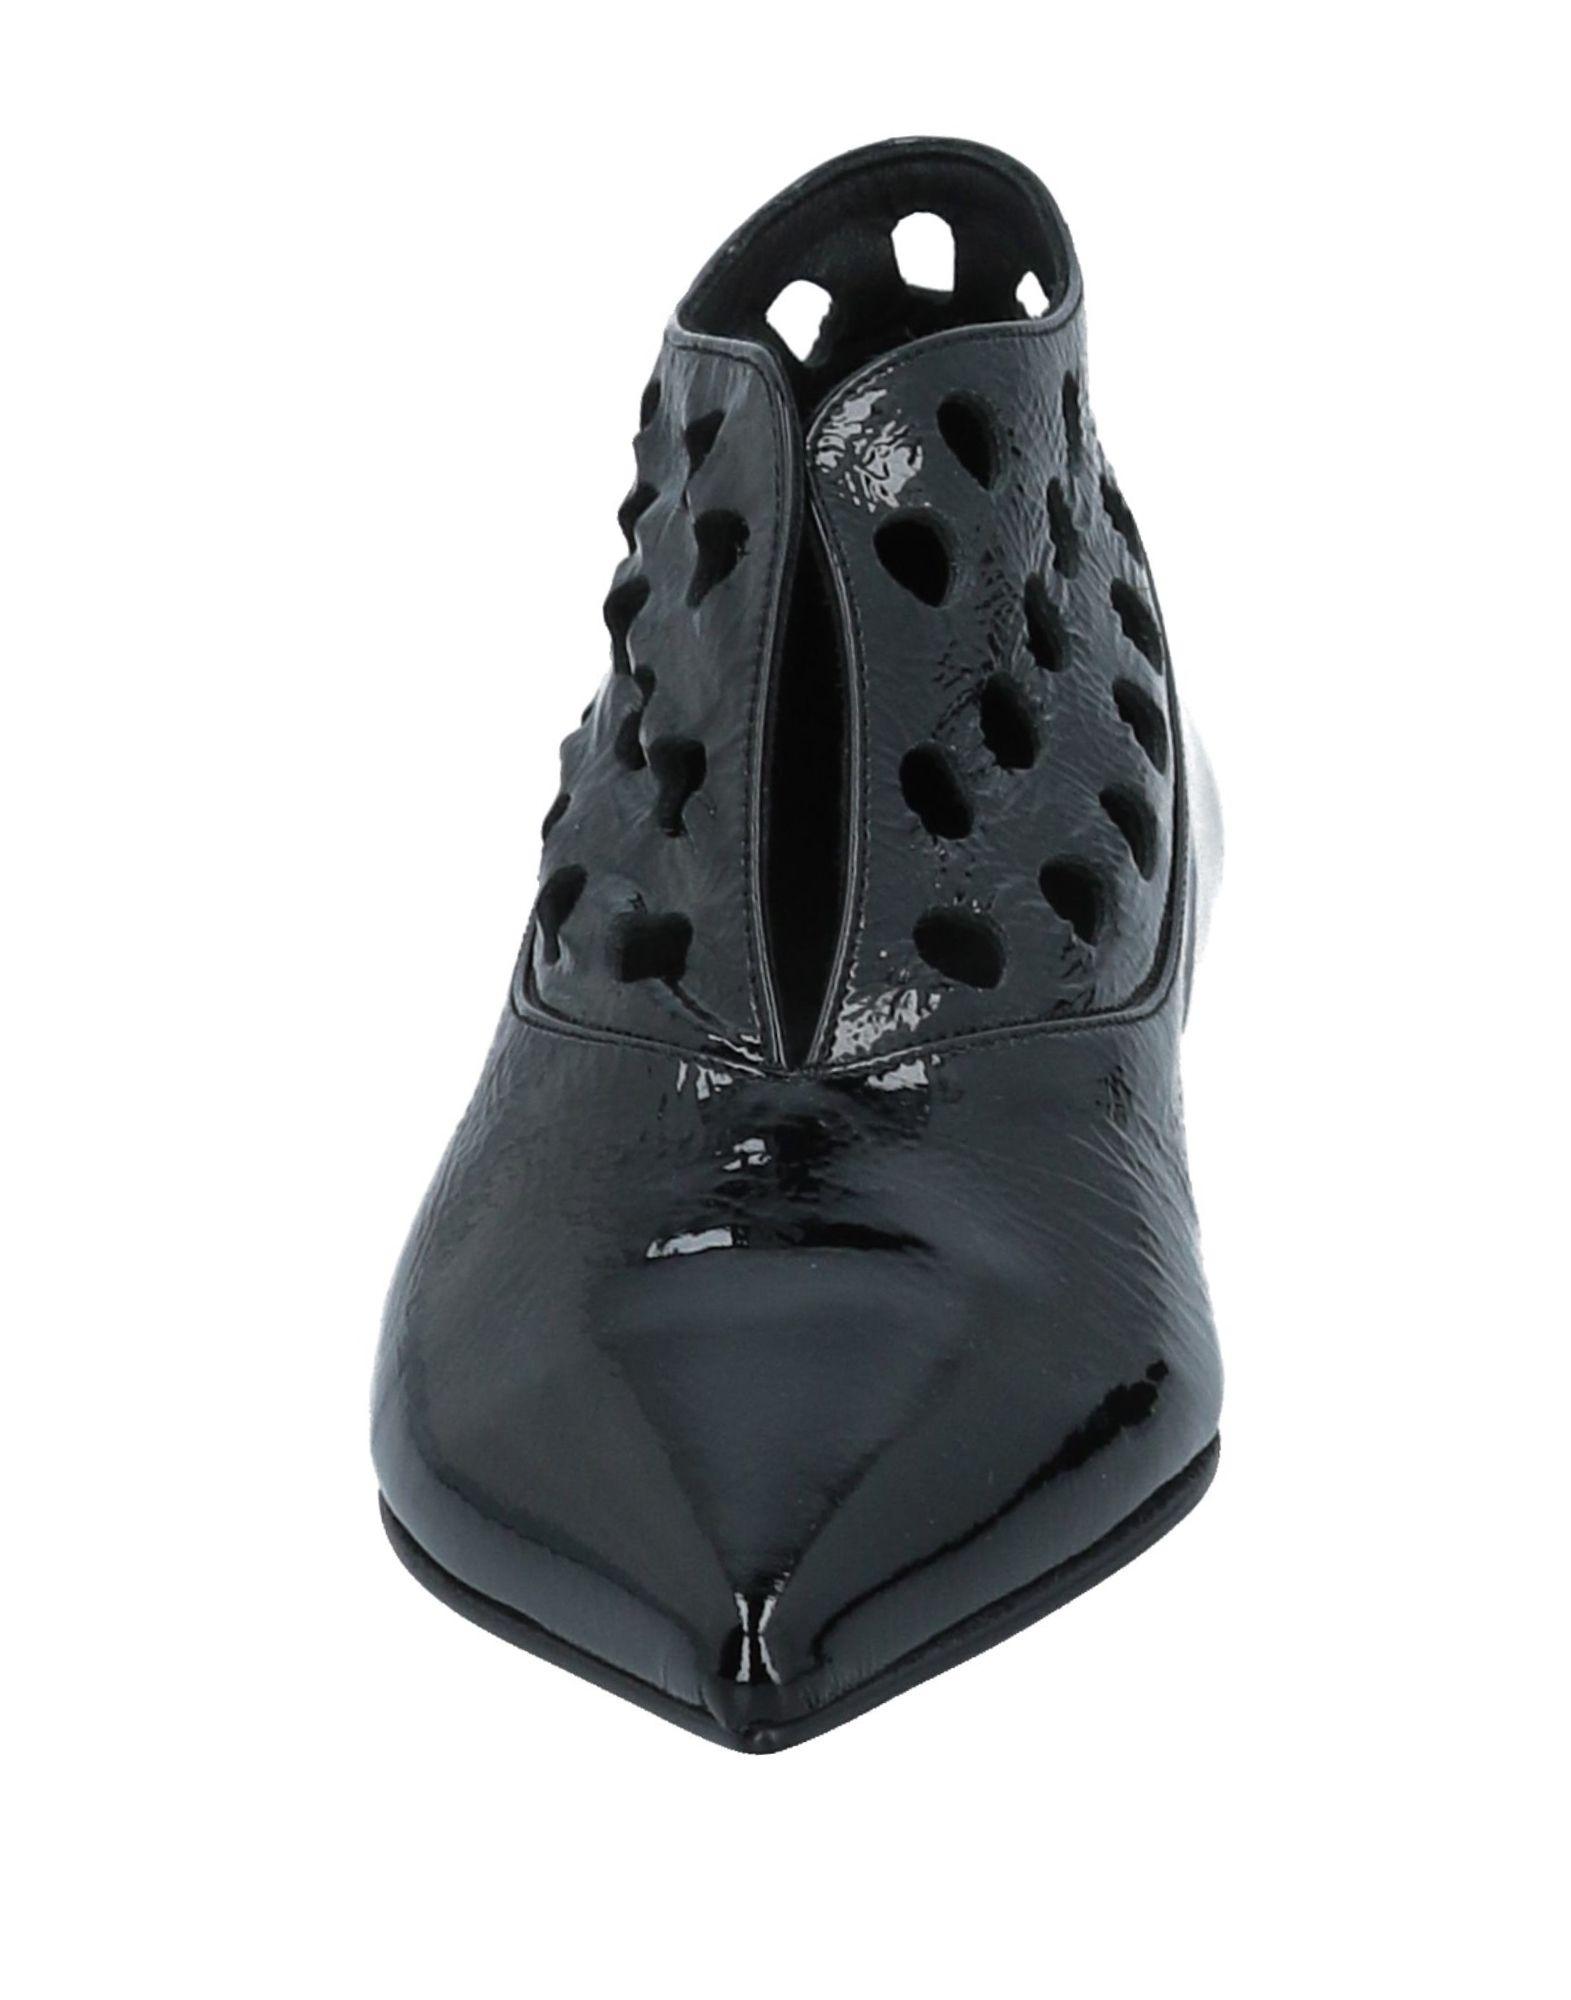 Stilvolle billige Schuhe Paloma 11516774JI Barceló Stiefelette Damen  11516774JI Paloma 70e3a1